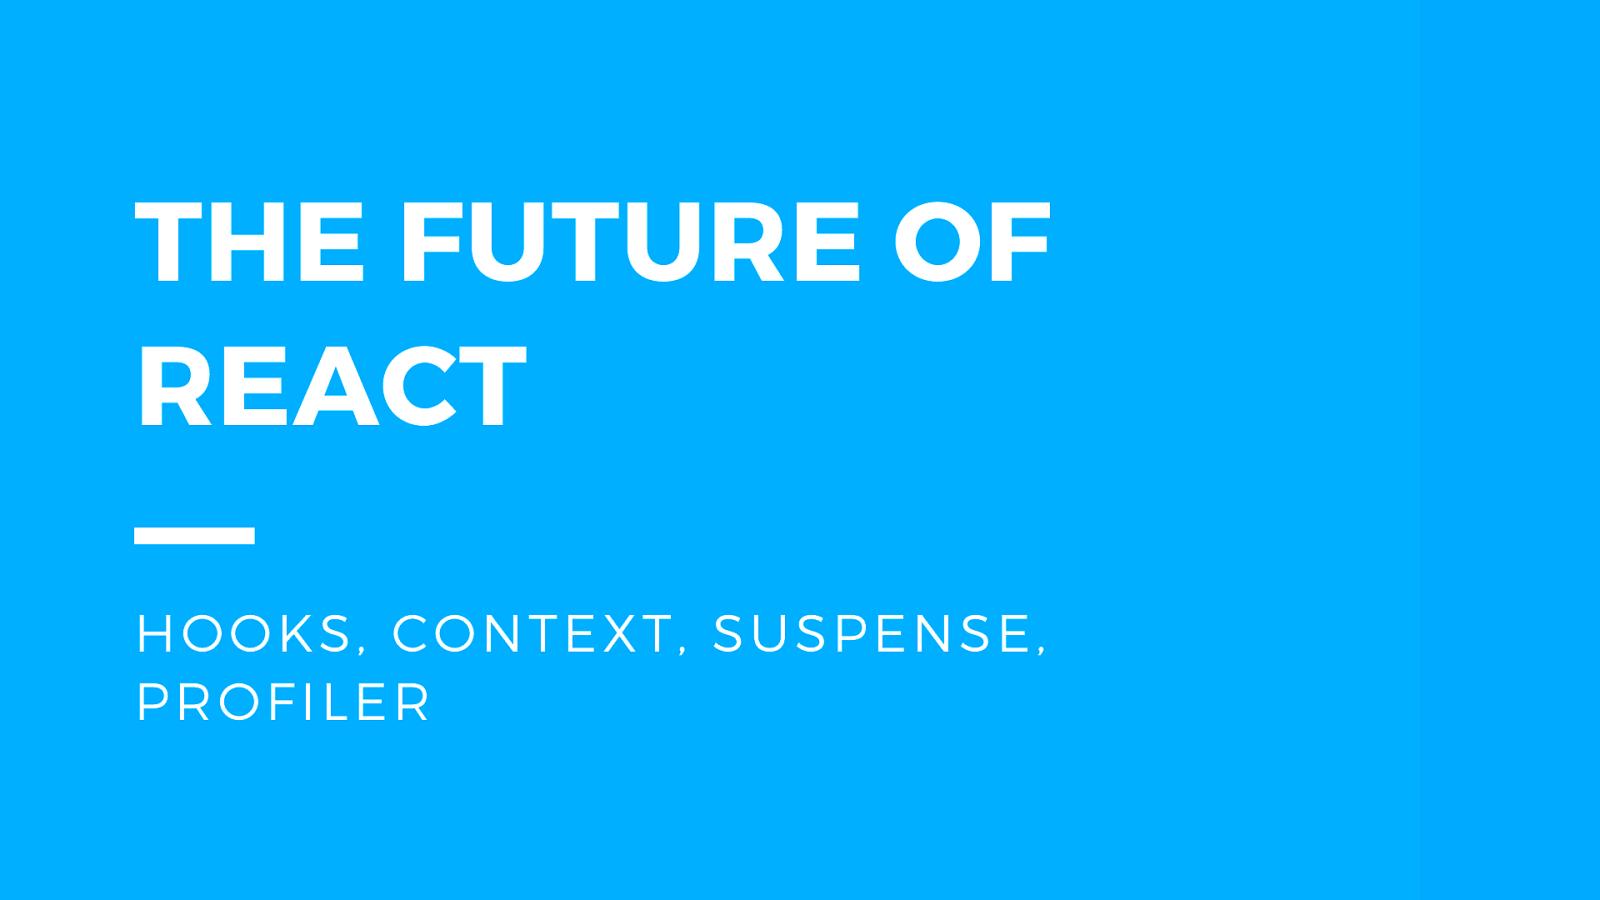 The Future of React